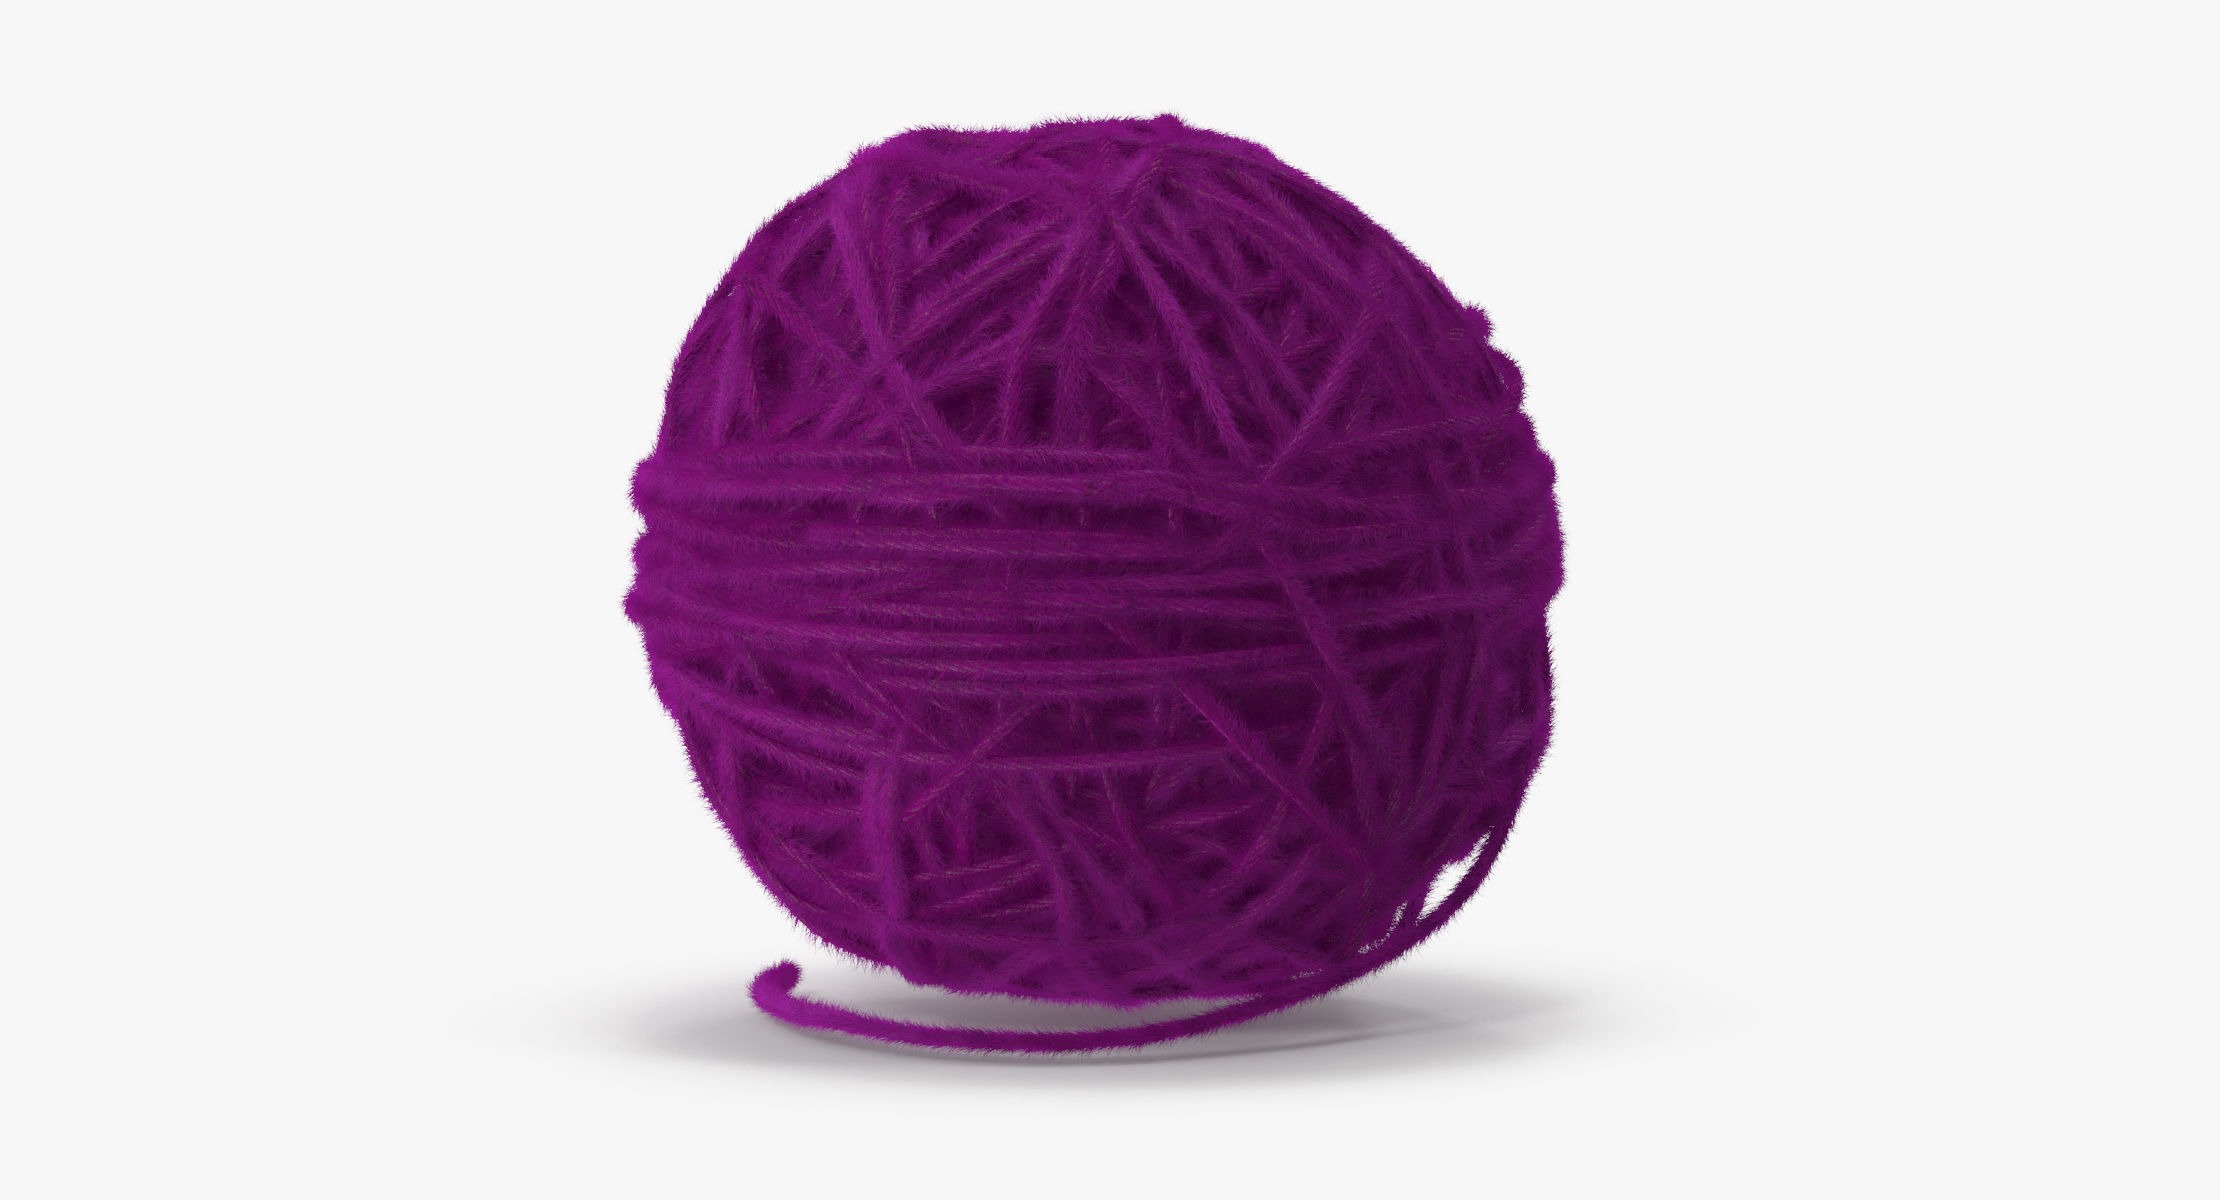 Ball of Yarn Purple - reel 1